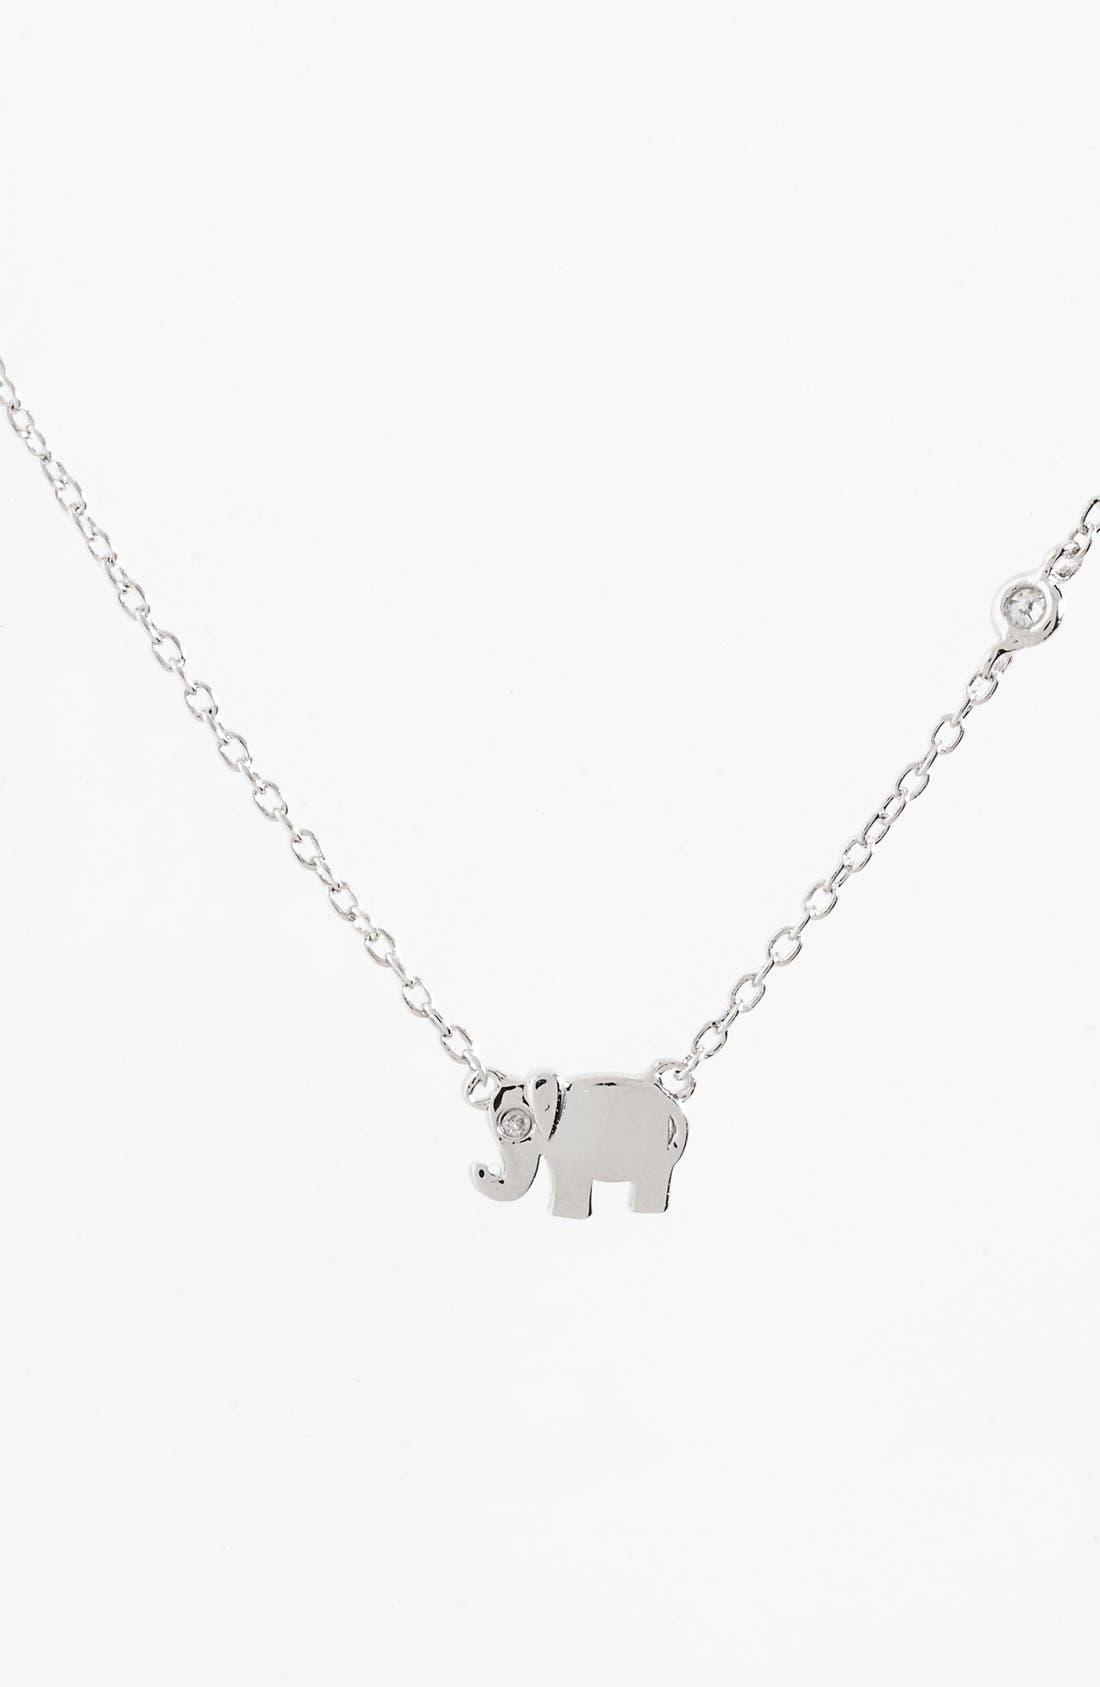 SHY by Sydney Evan Elephant Necklace,                         Main,                         color, Silver